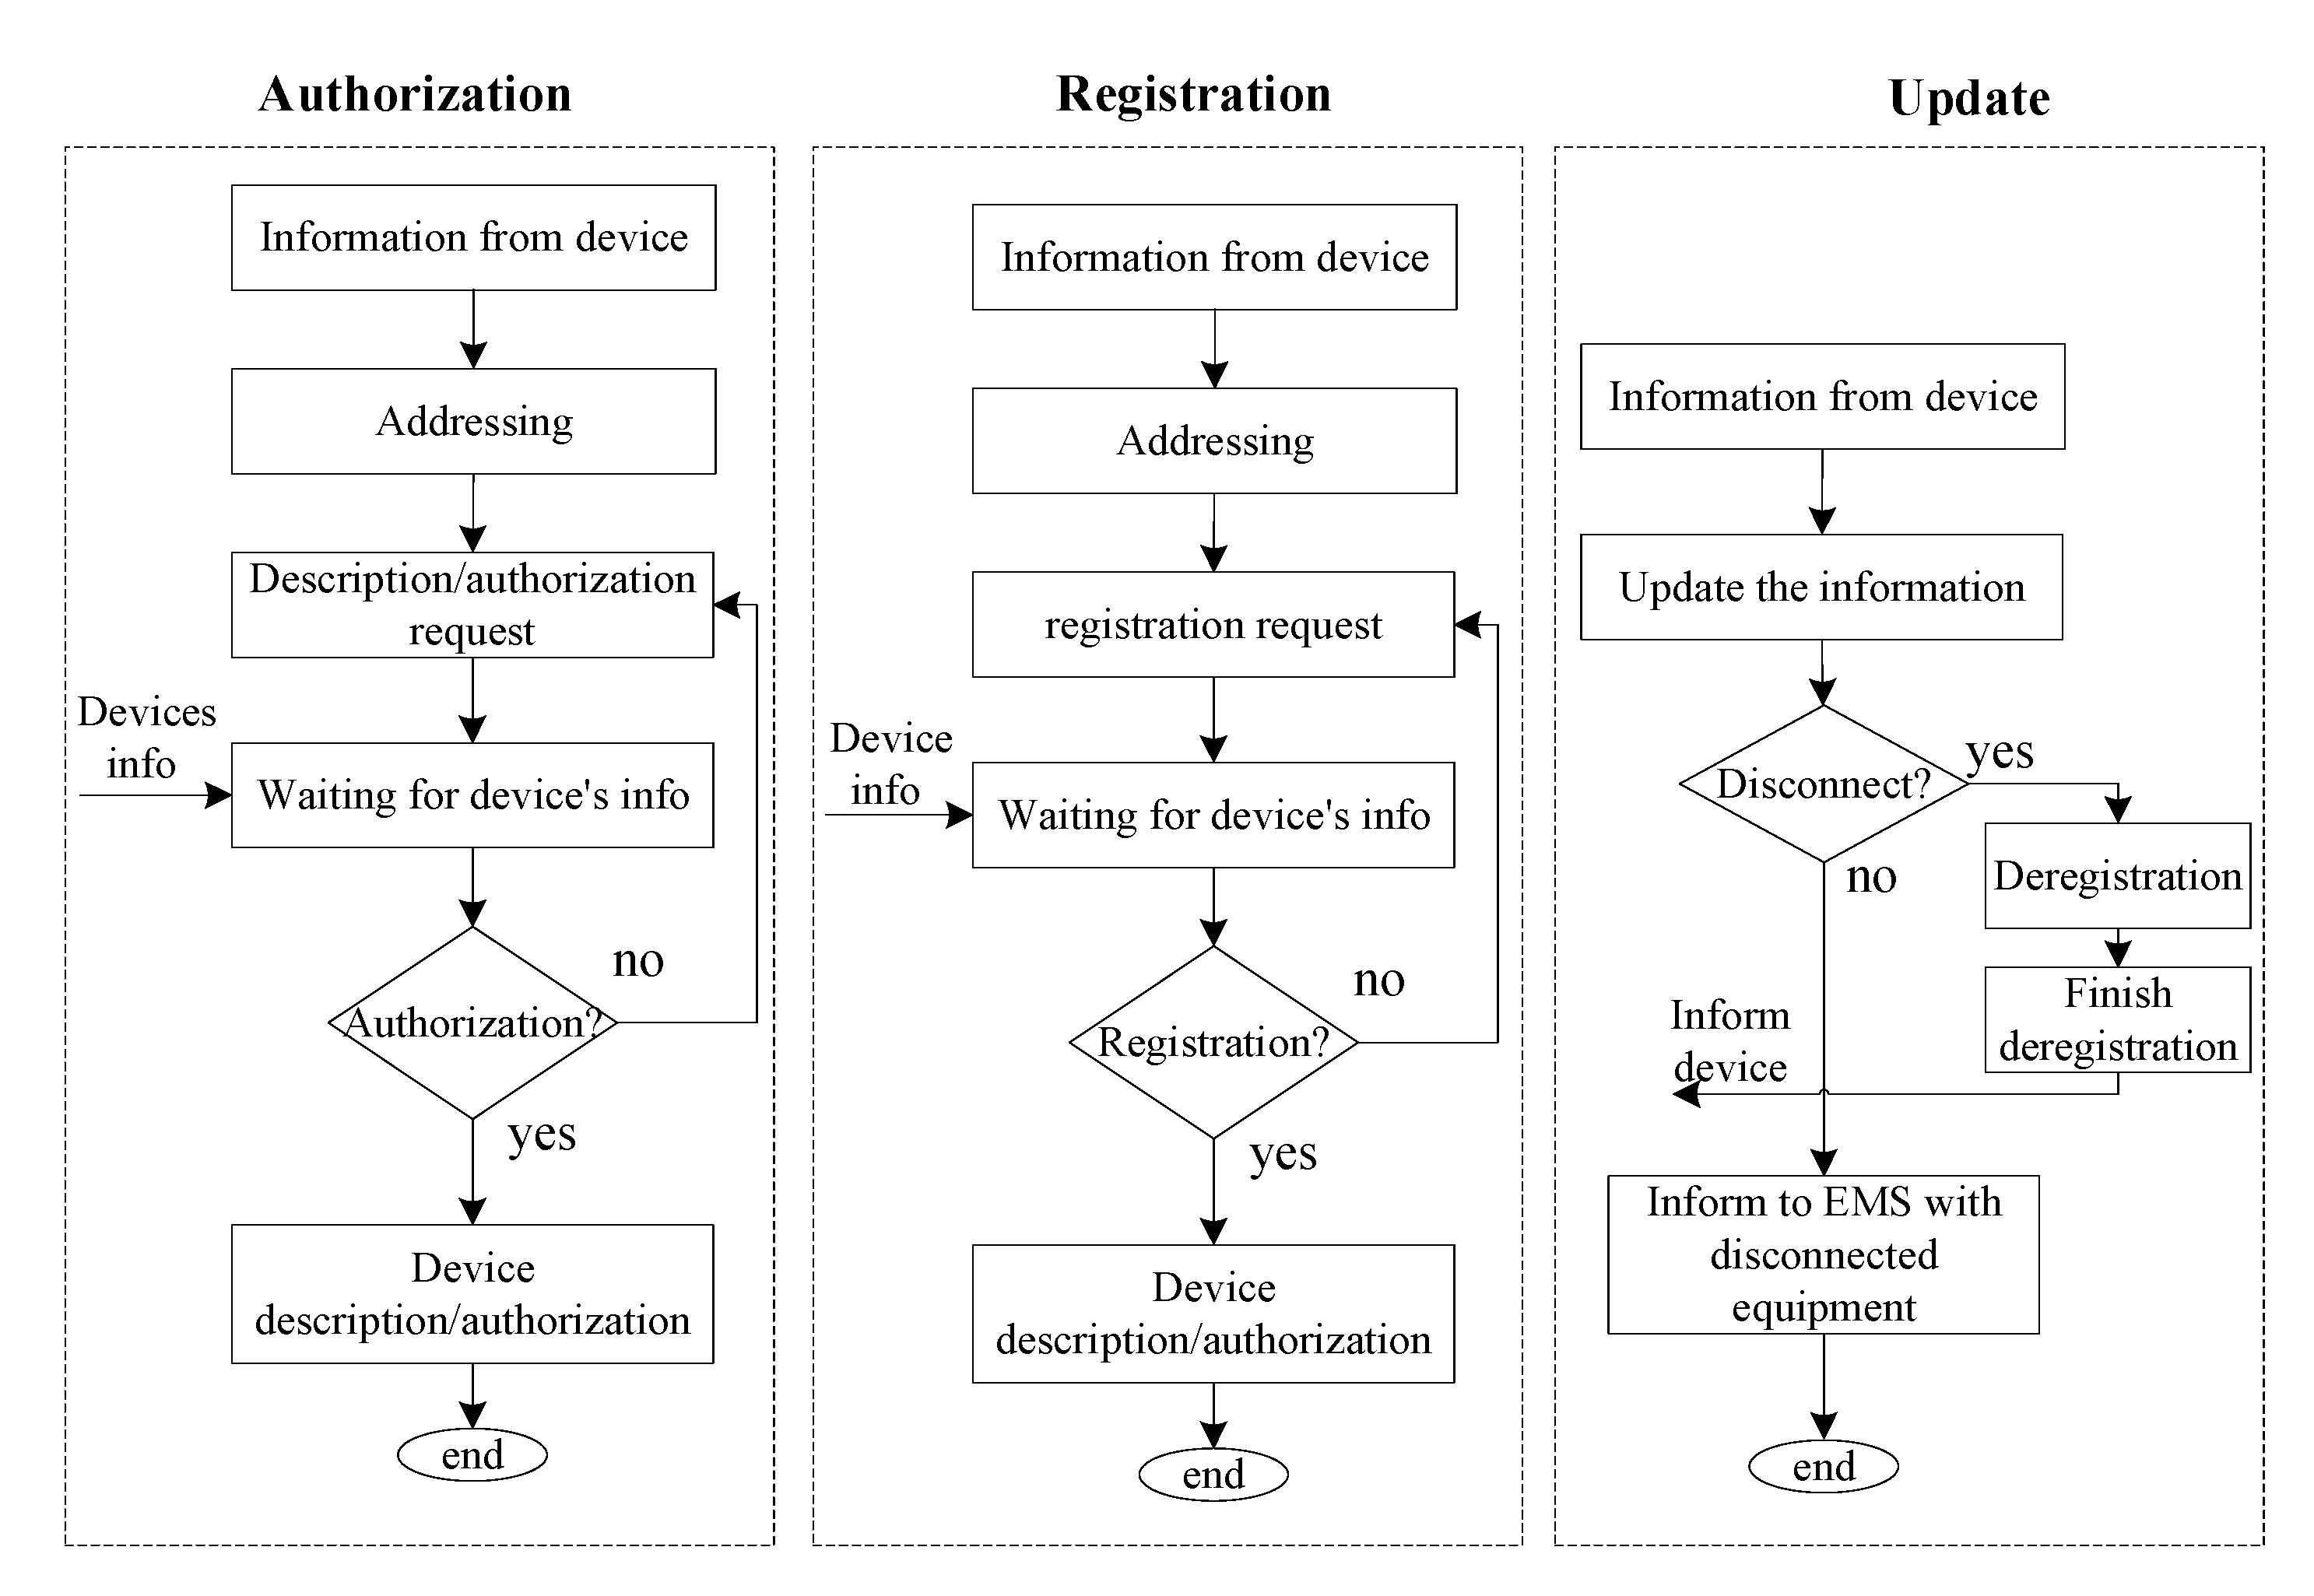 cplex manual 12.6 pdf